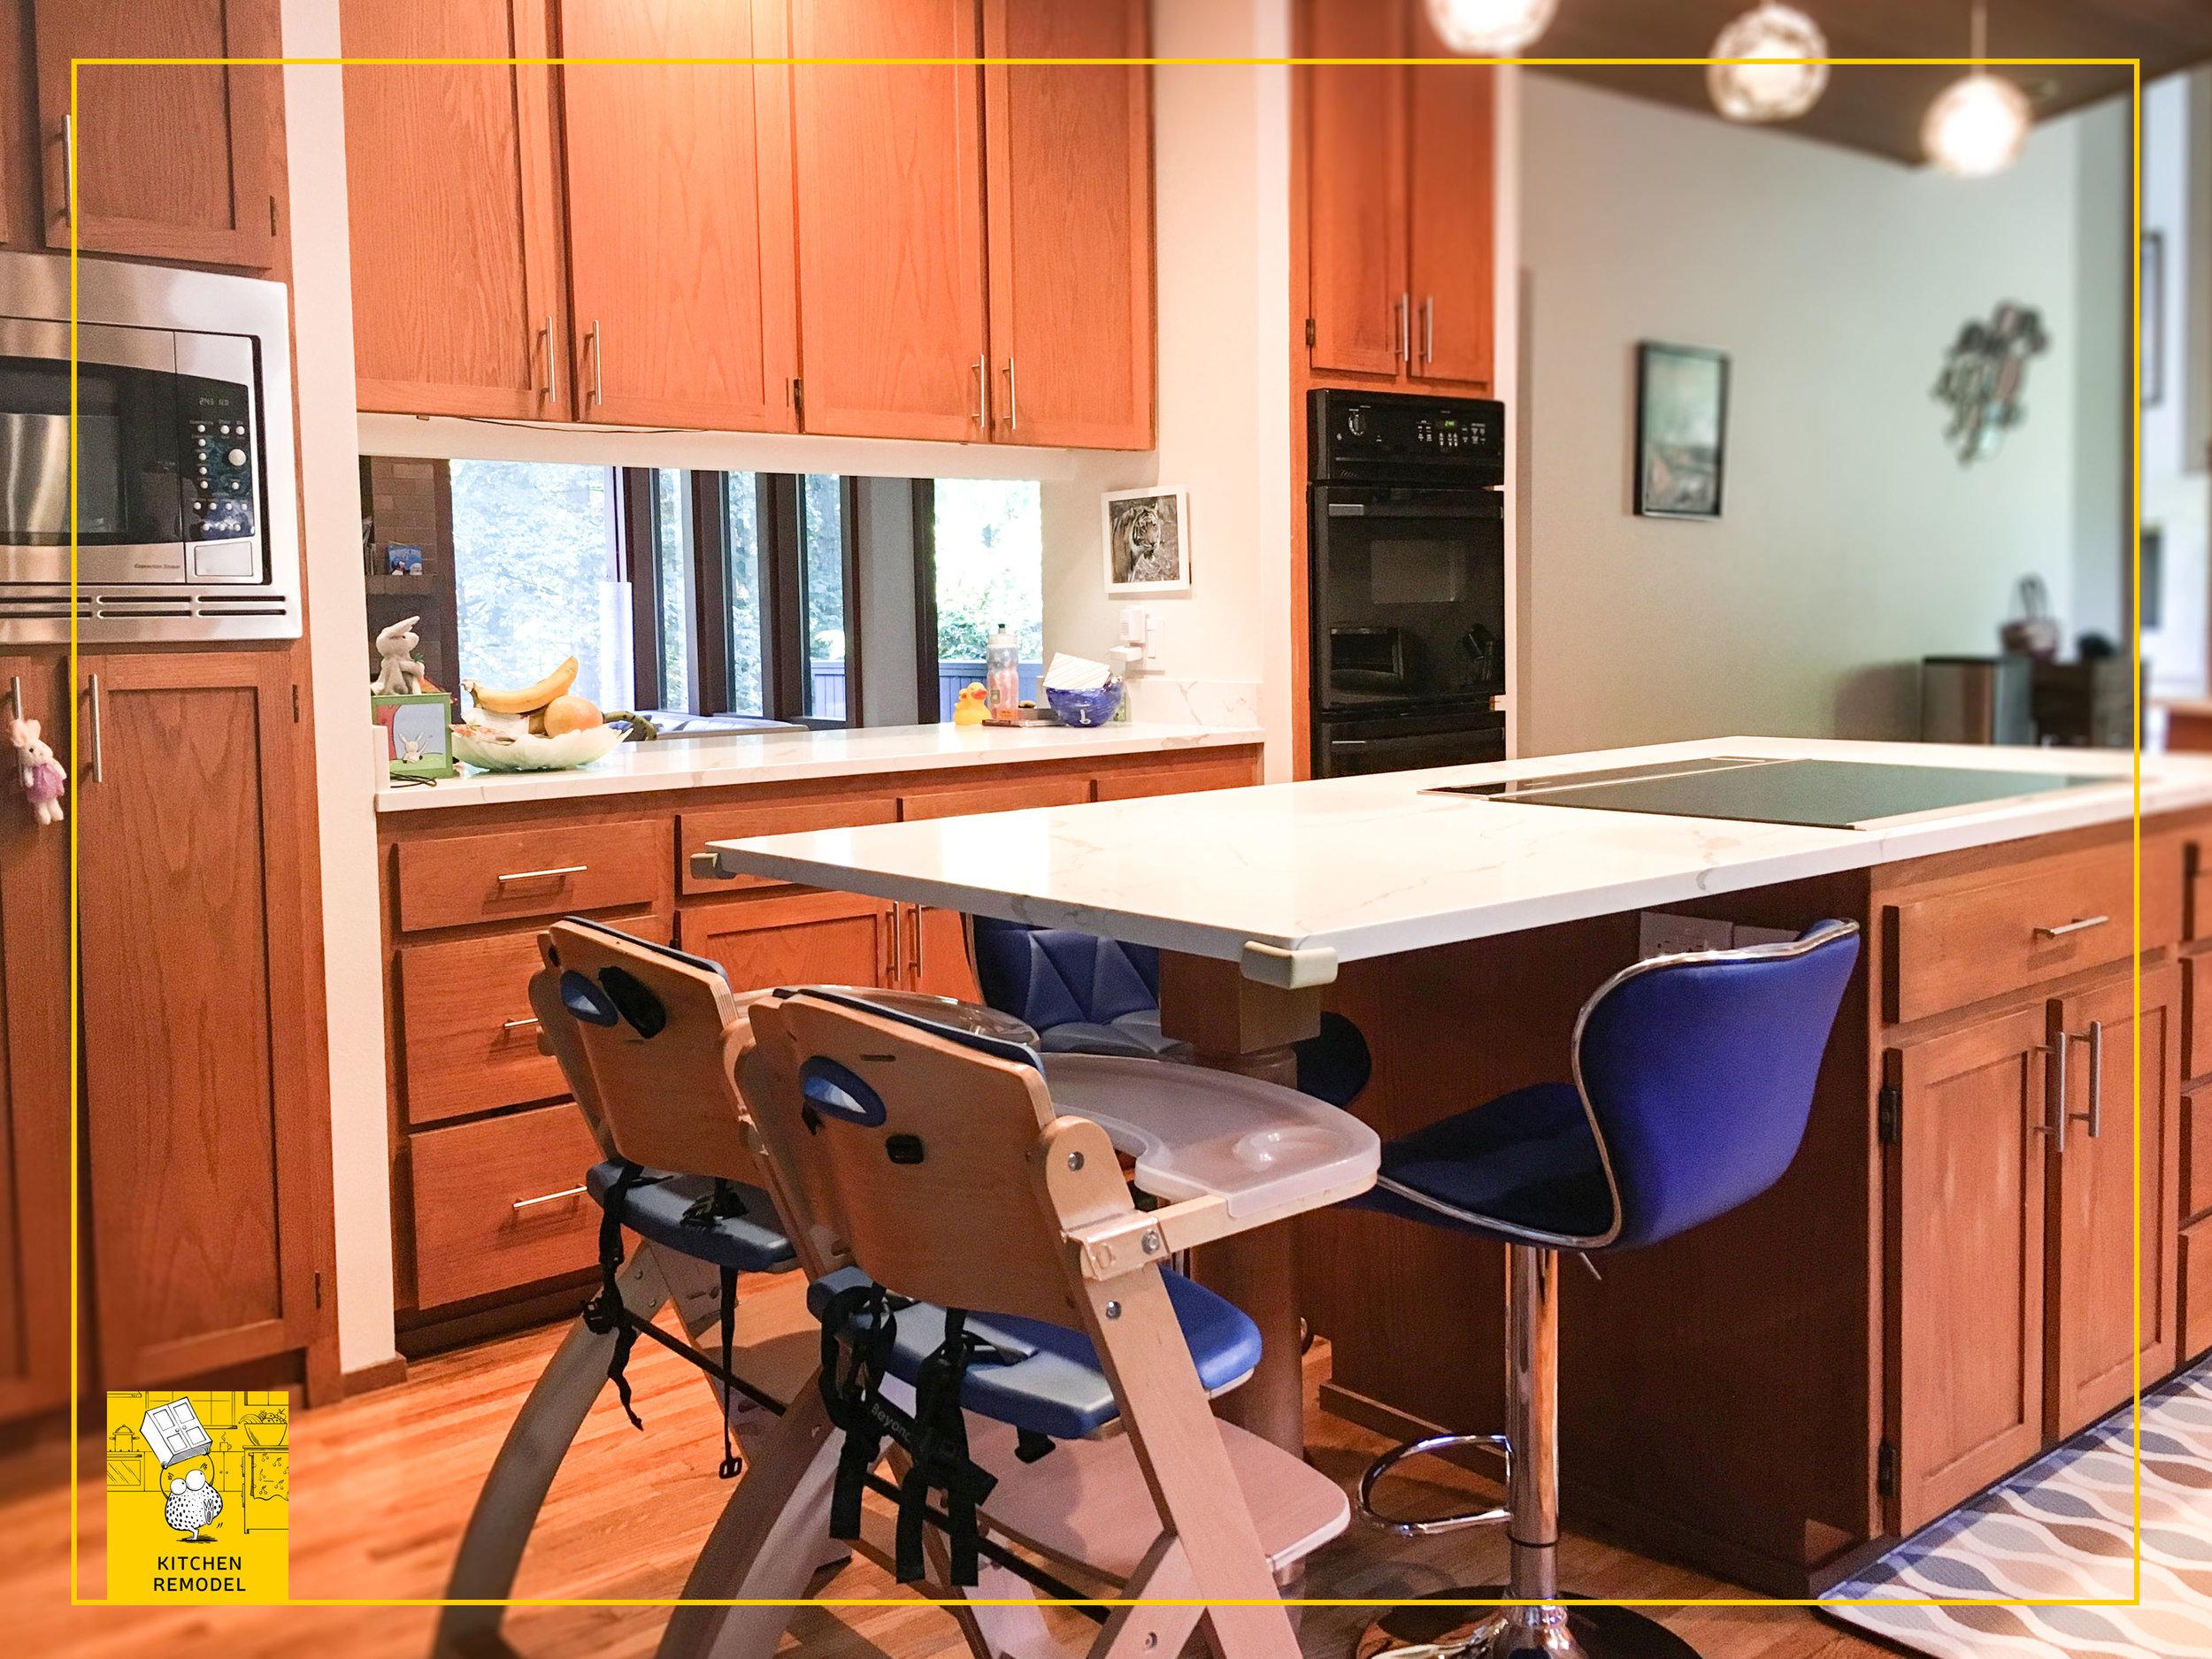 MT family kitchen remodel 02.jpg